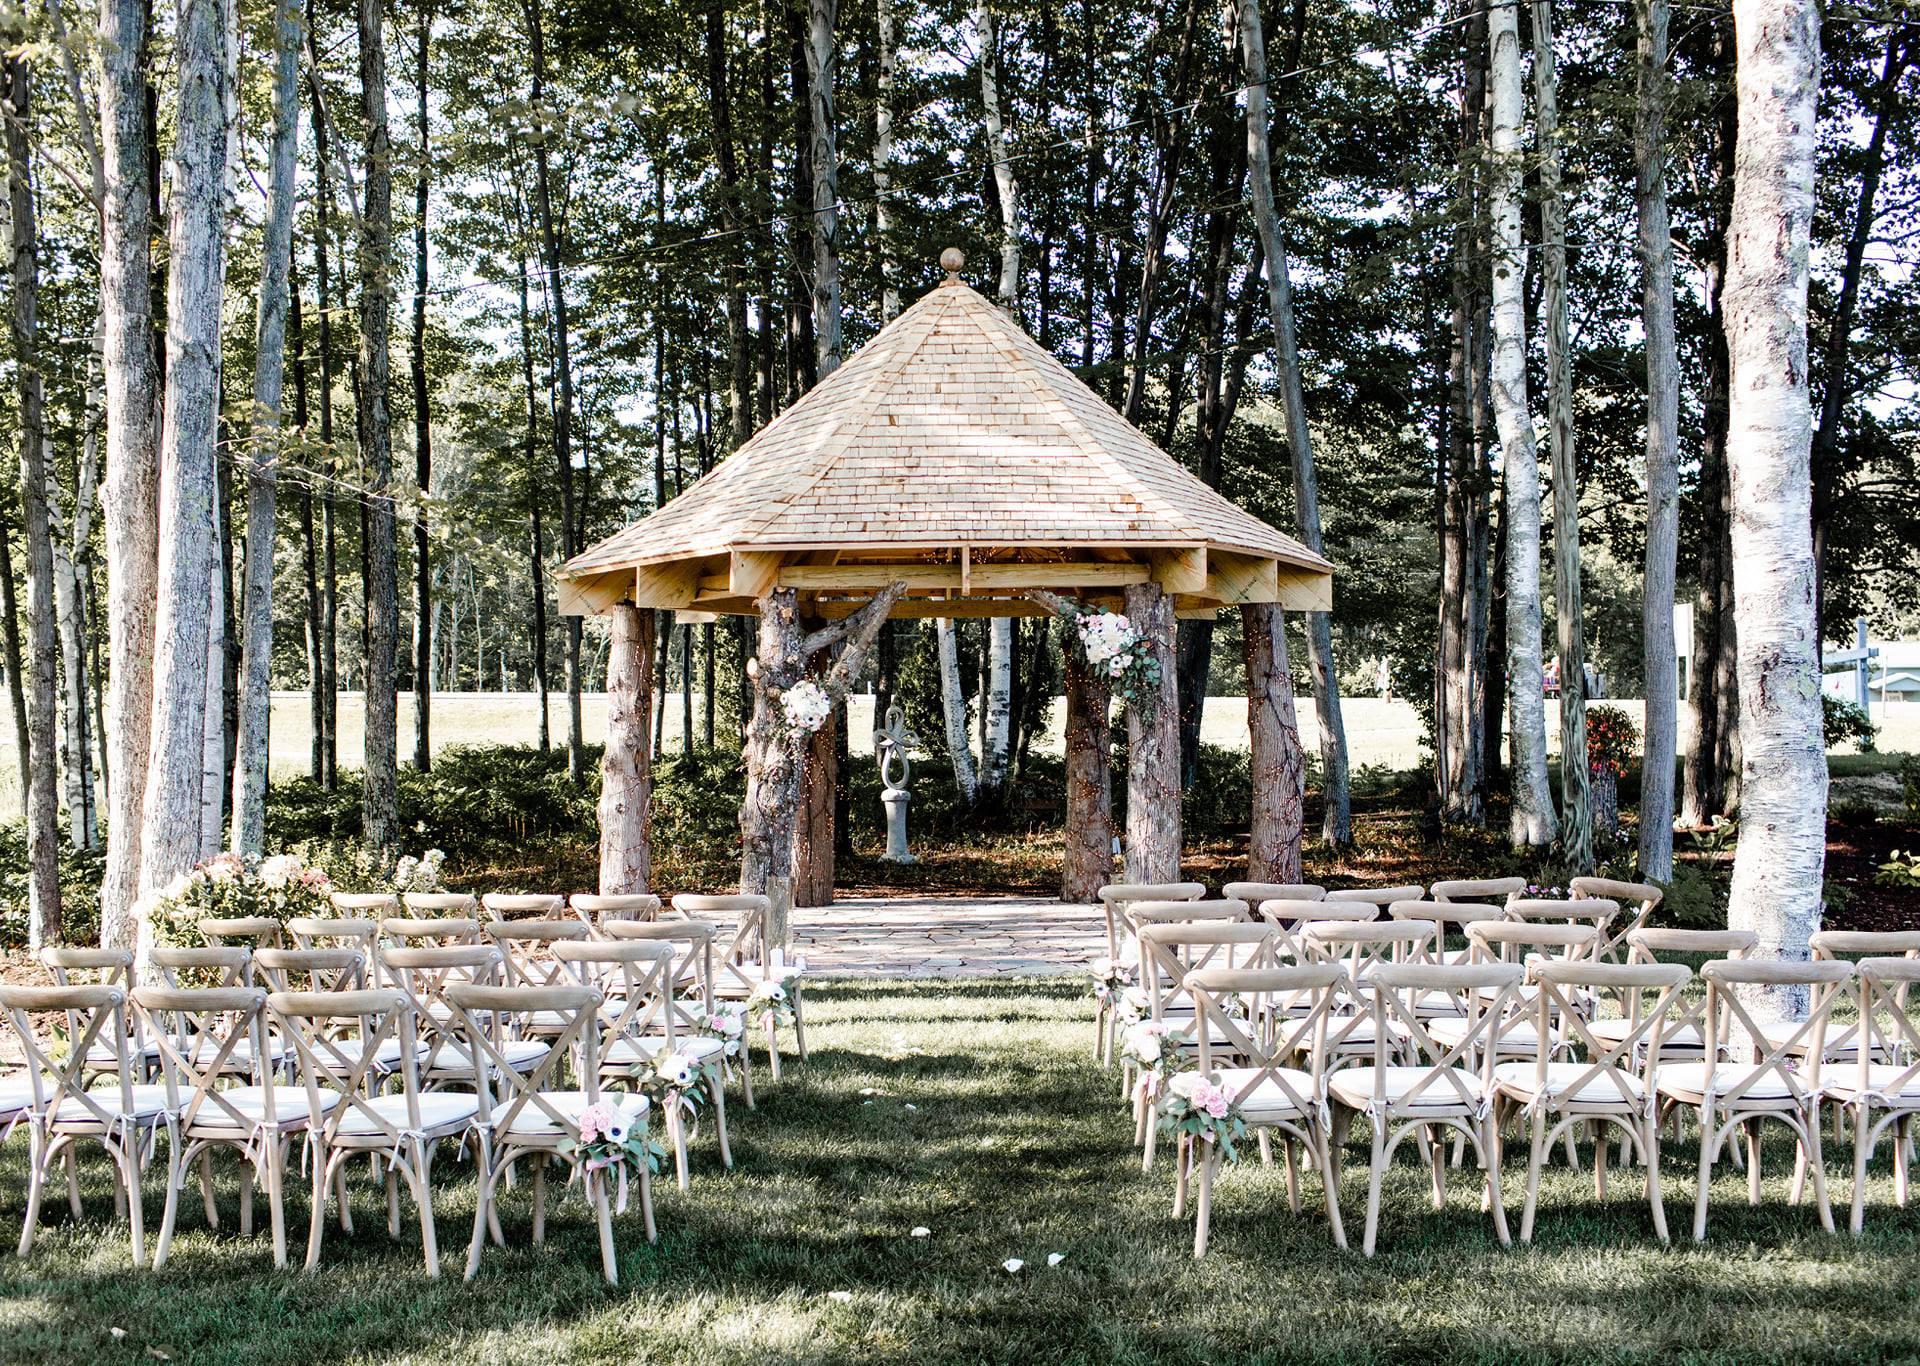 Cedar Gazebo in the wedding venue